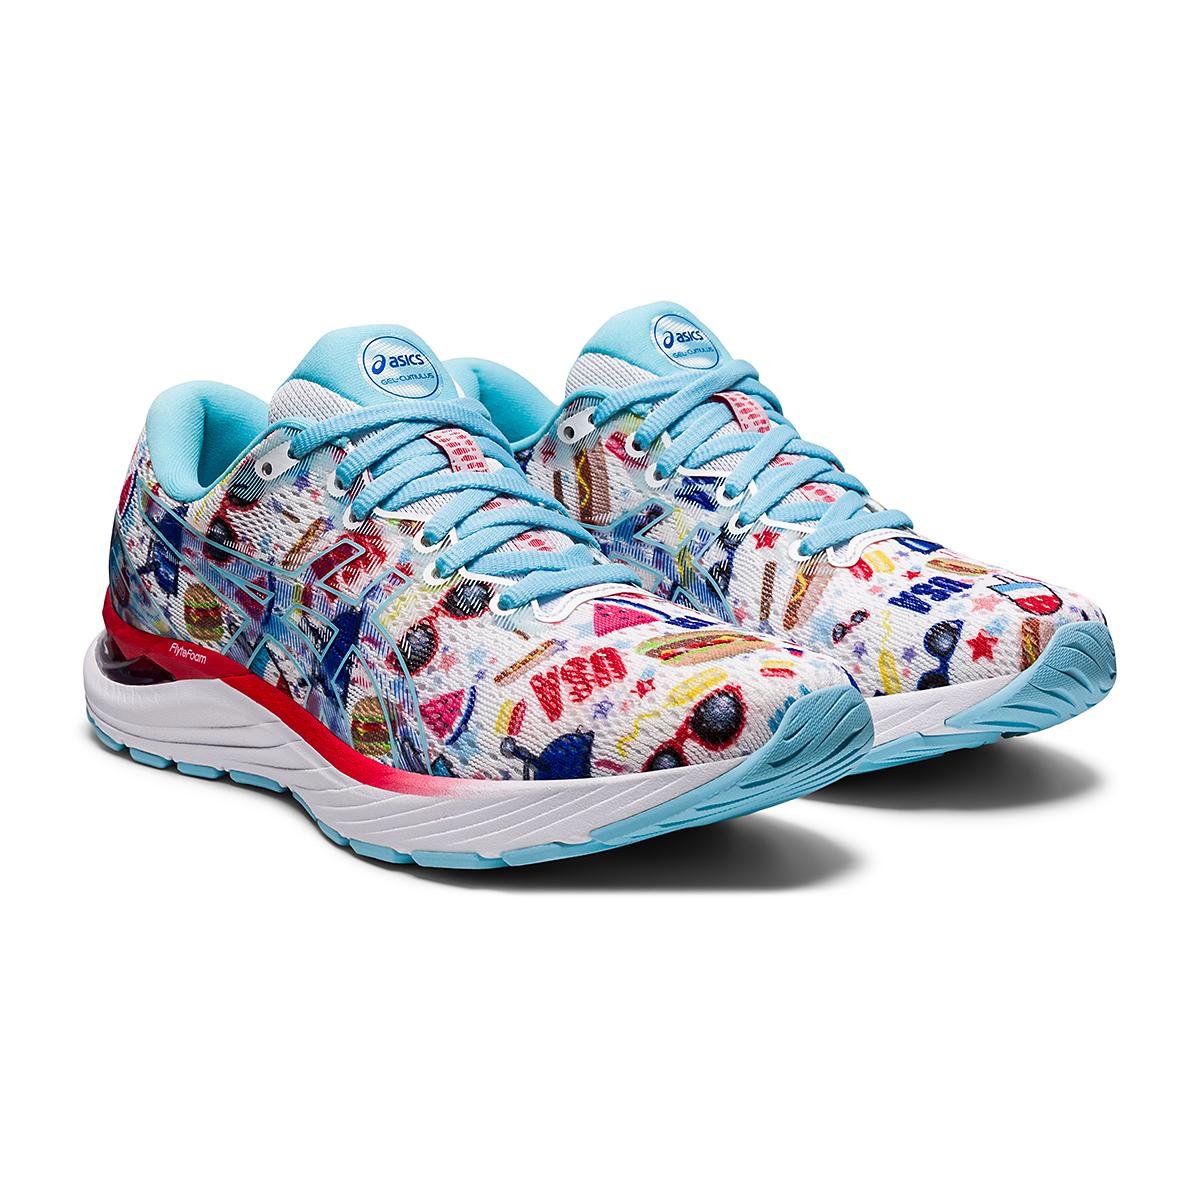 Women's Asics Gel-Cumulus 23 Cookout Running Shoe - Color: White/Asics Blue - Size: 5 - Width: Regular, White/Asics Blue, large, image 3